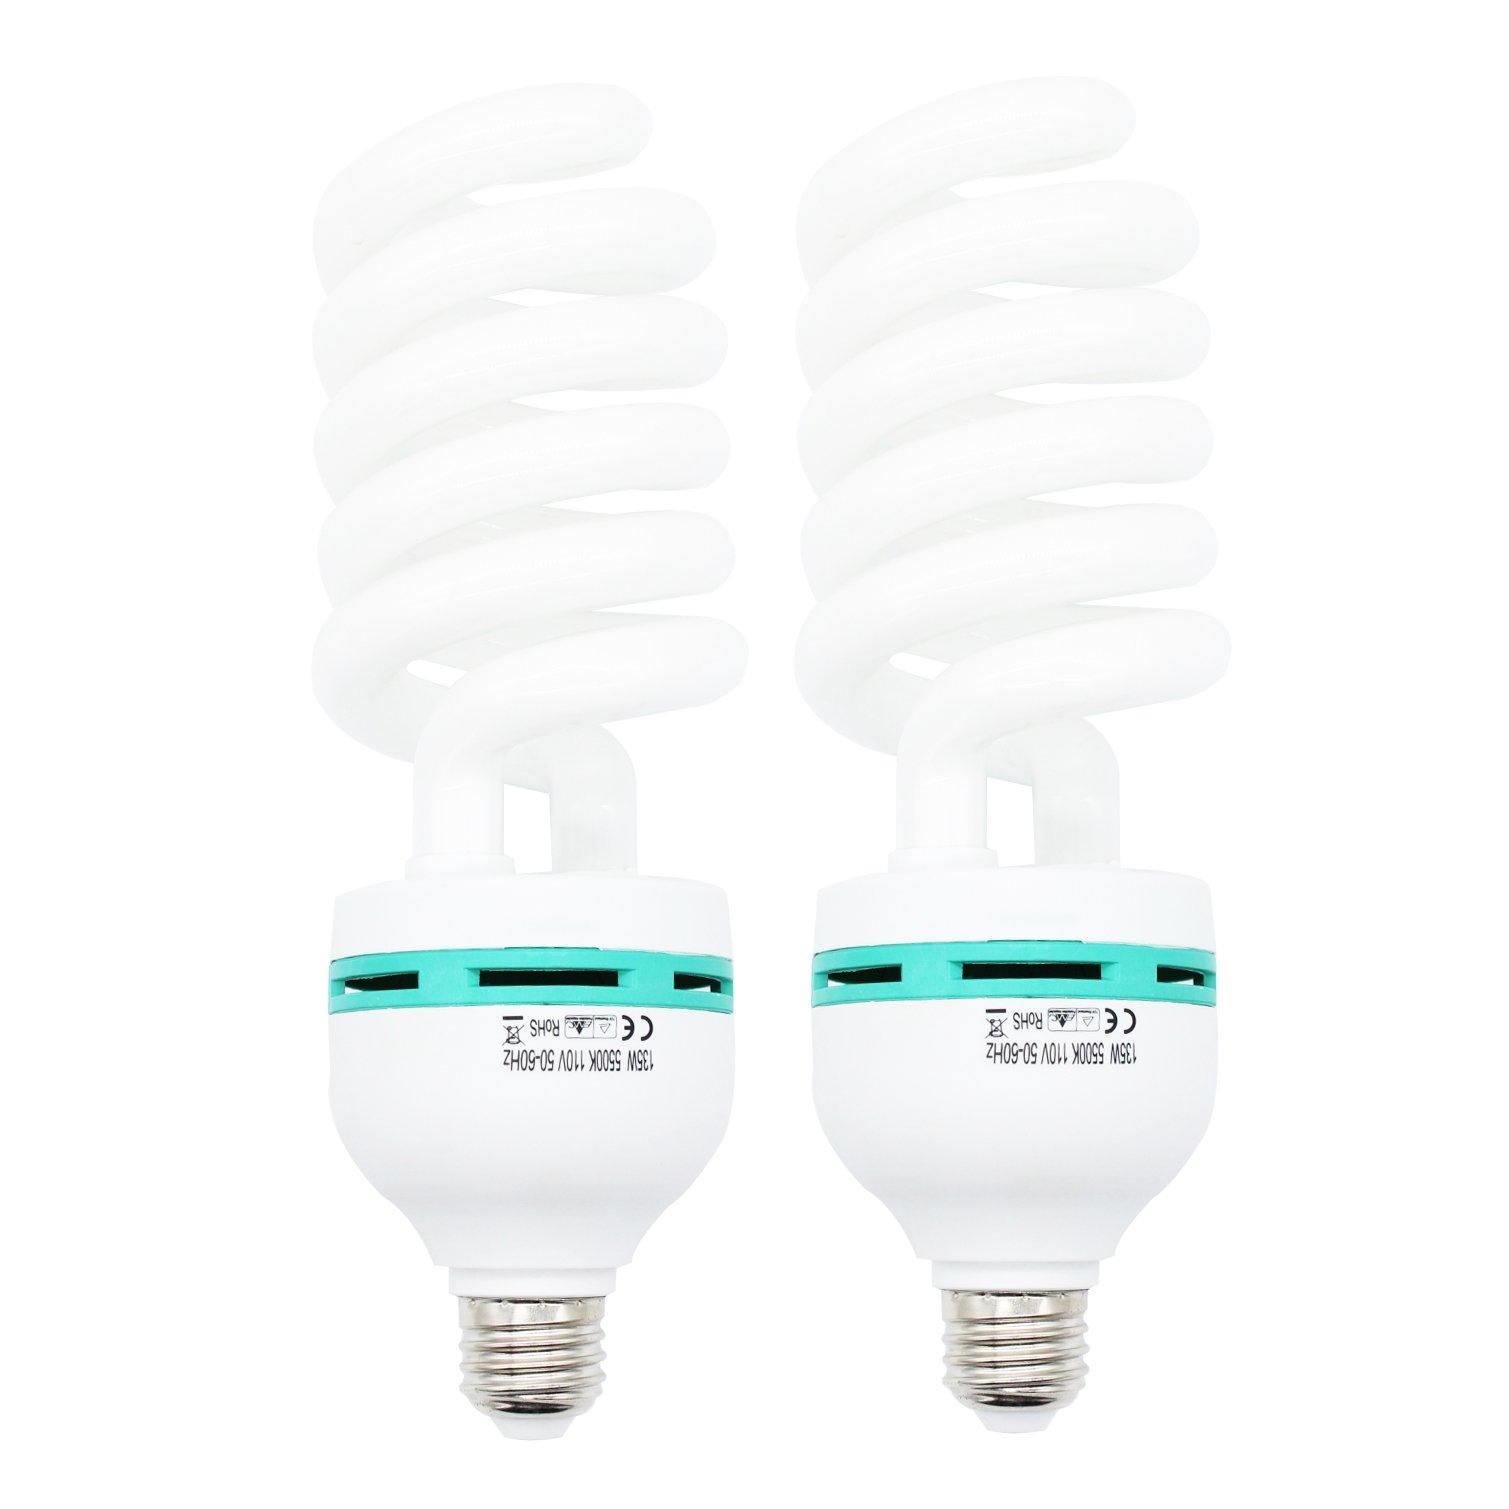 Foto&Tech 135 Watt Daylight Photography Fluorescent Spiral Light Bulb 5500K 110V White for Photography and Video Studio Lighting (2 Pack)